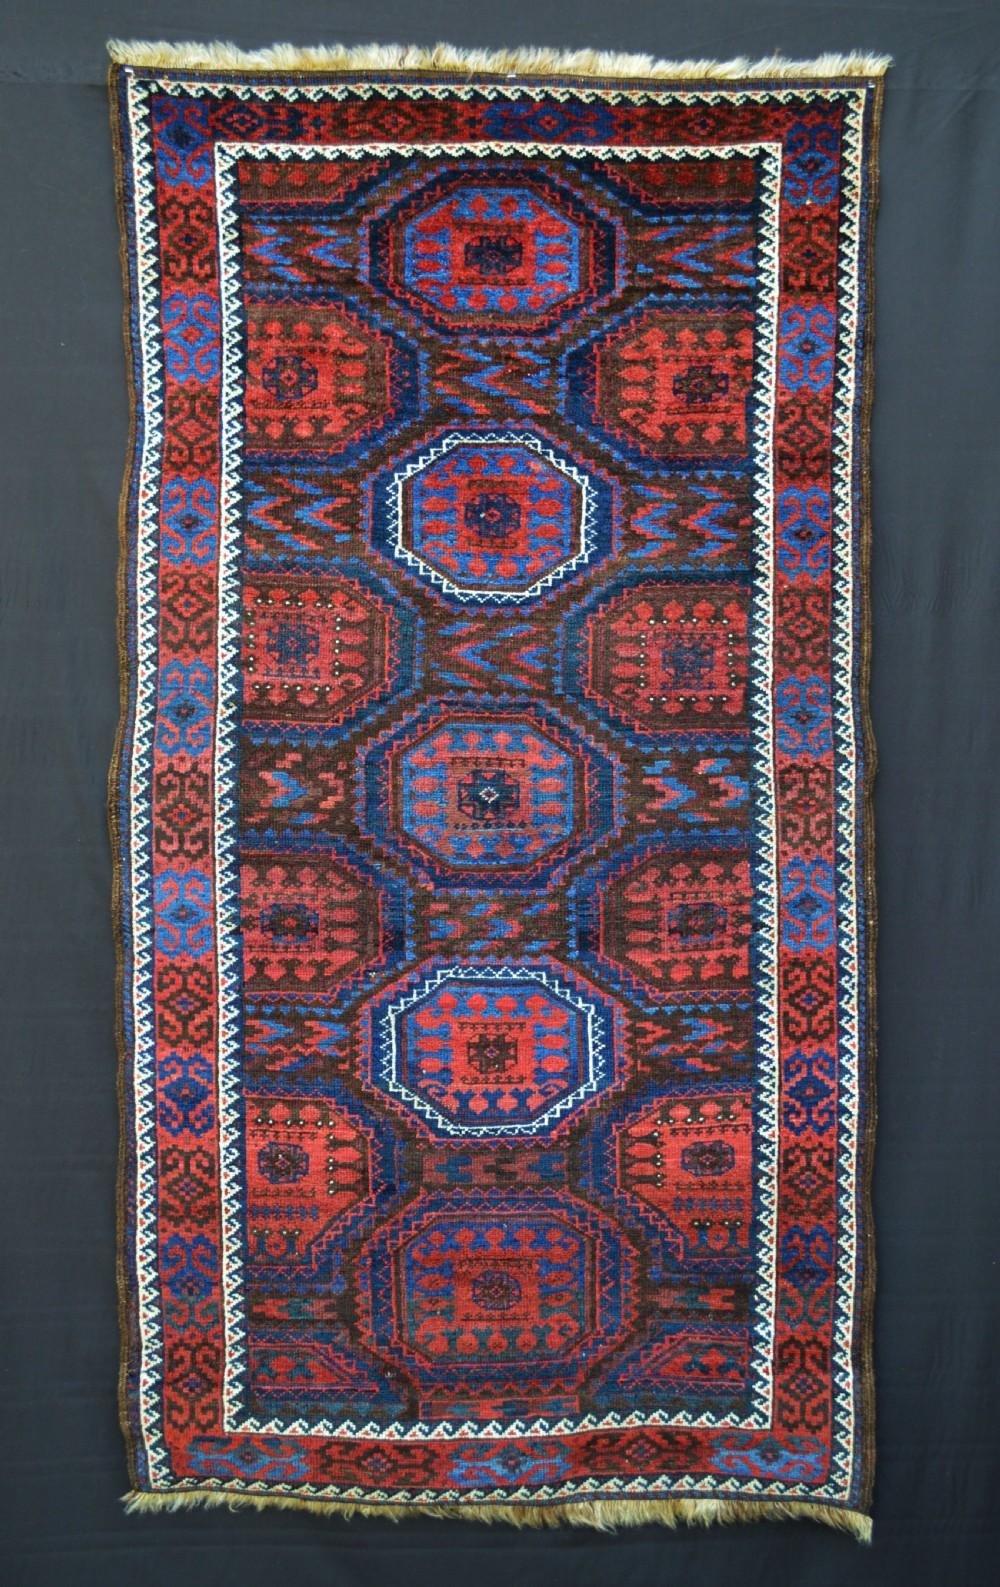 antique baluch rug mahdad khani tribe khorassan province northeast persia